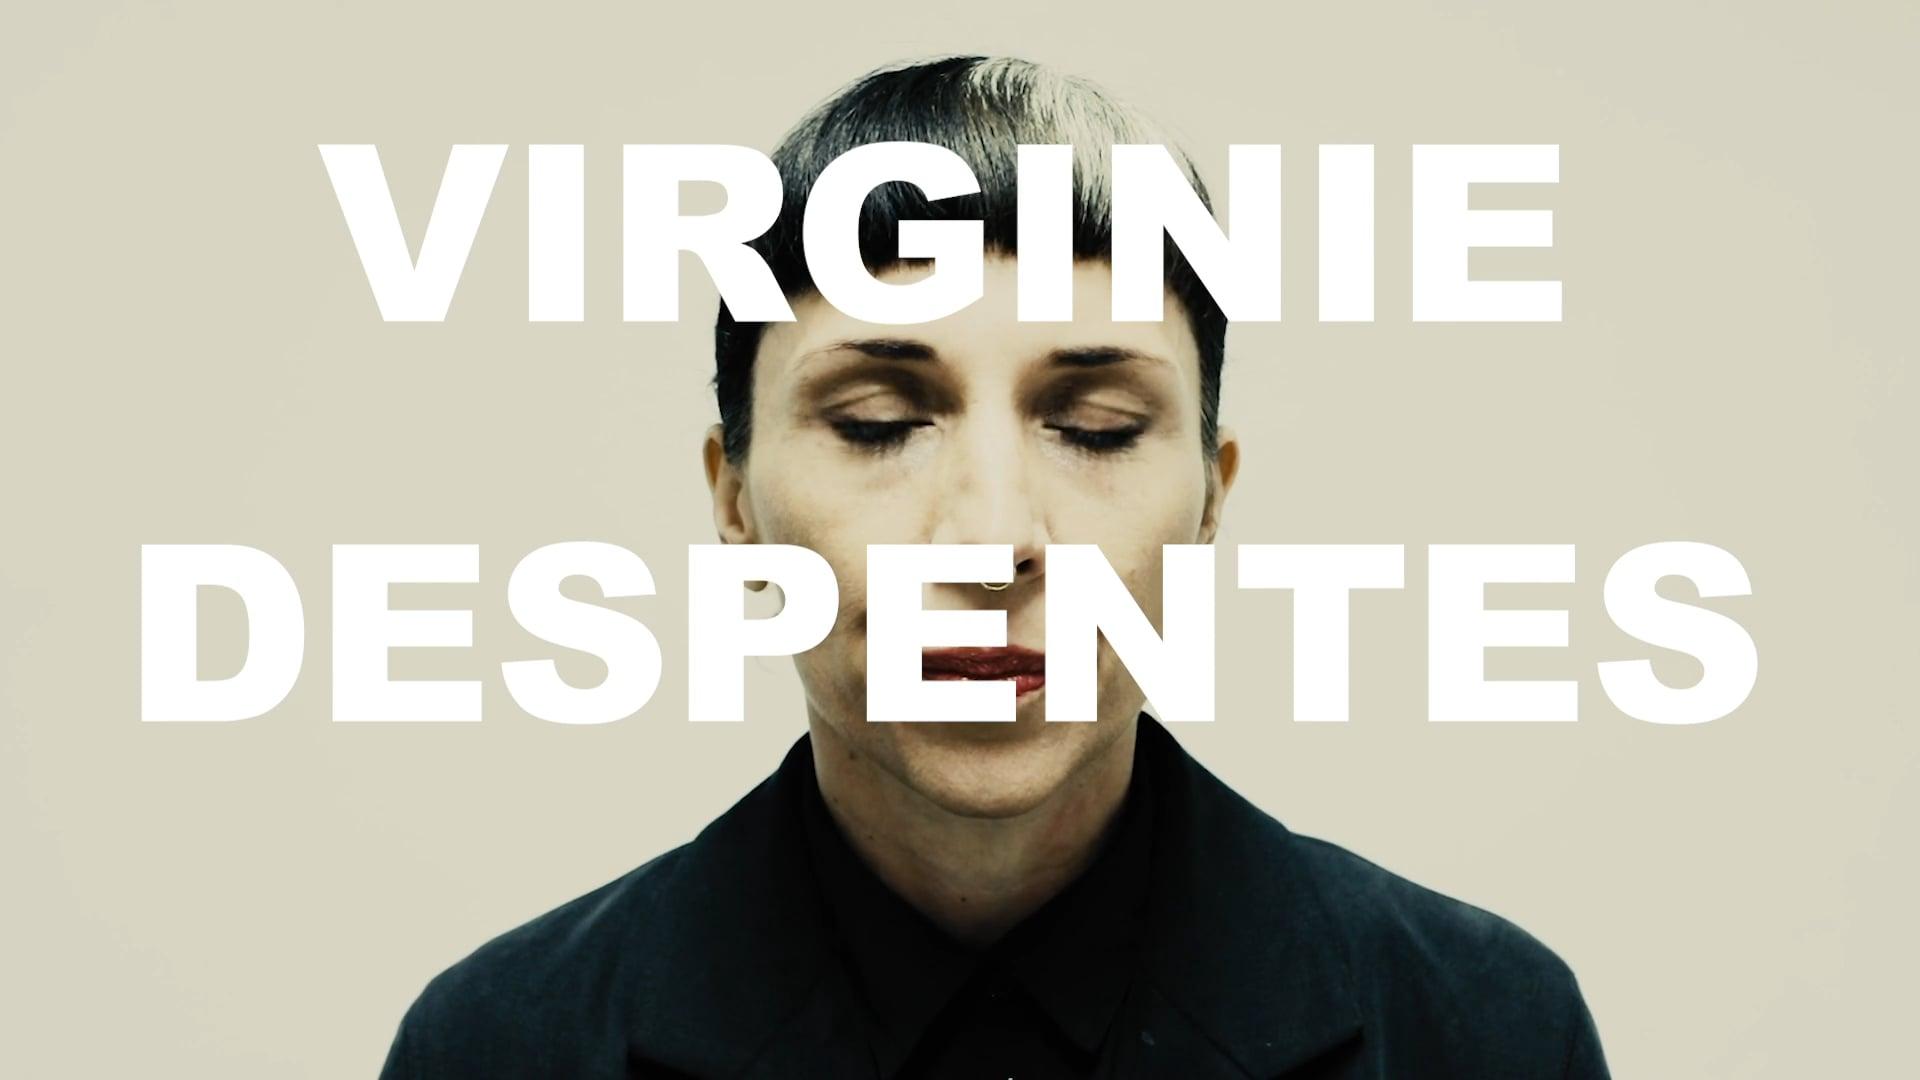 EXTRAIT DE KING KONG THEORIE DE VIRGINIE DESPENTES par Caroline Gay